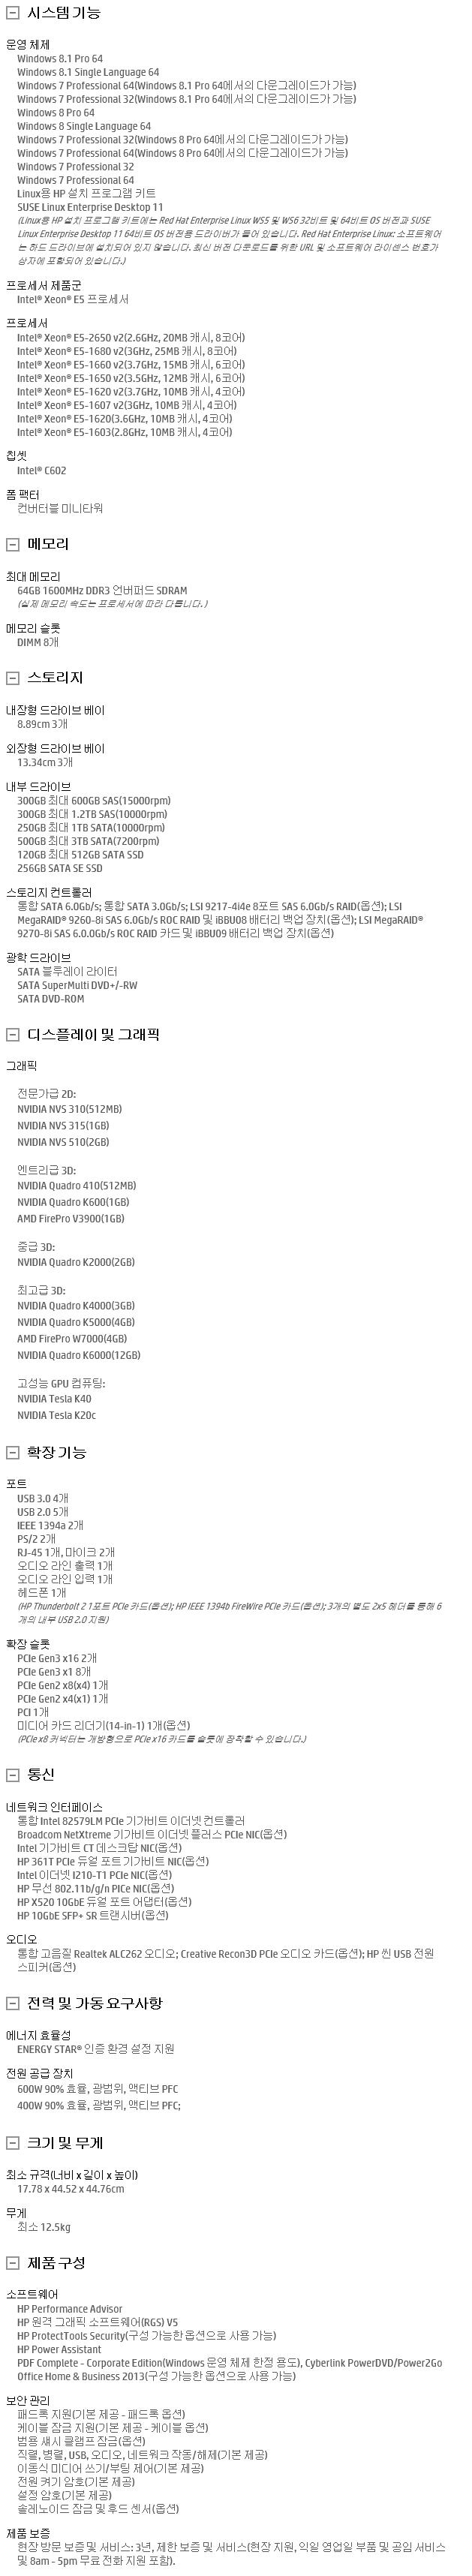 HP Z420 Xeon E5-2670 2 6GHz/NVS295/SATA 500G